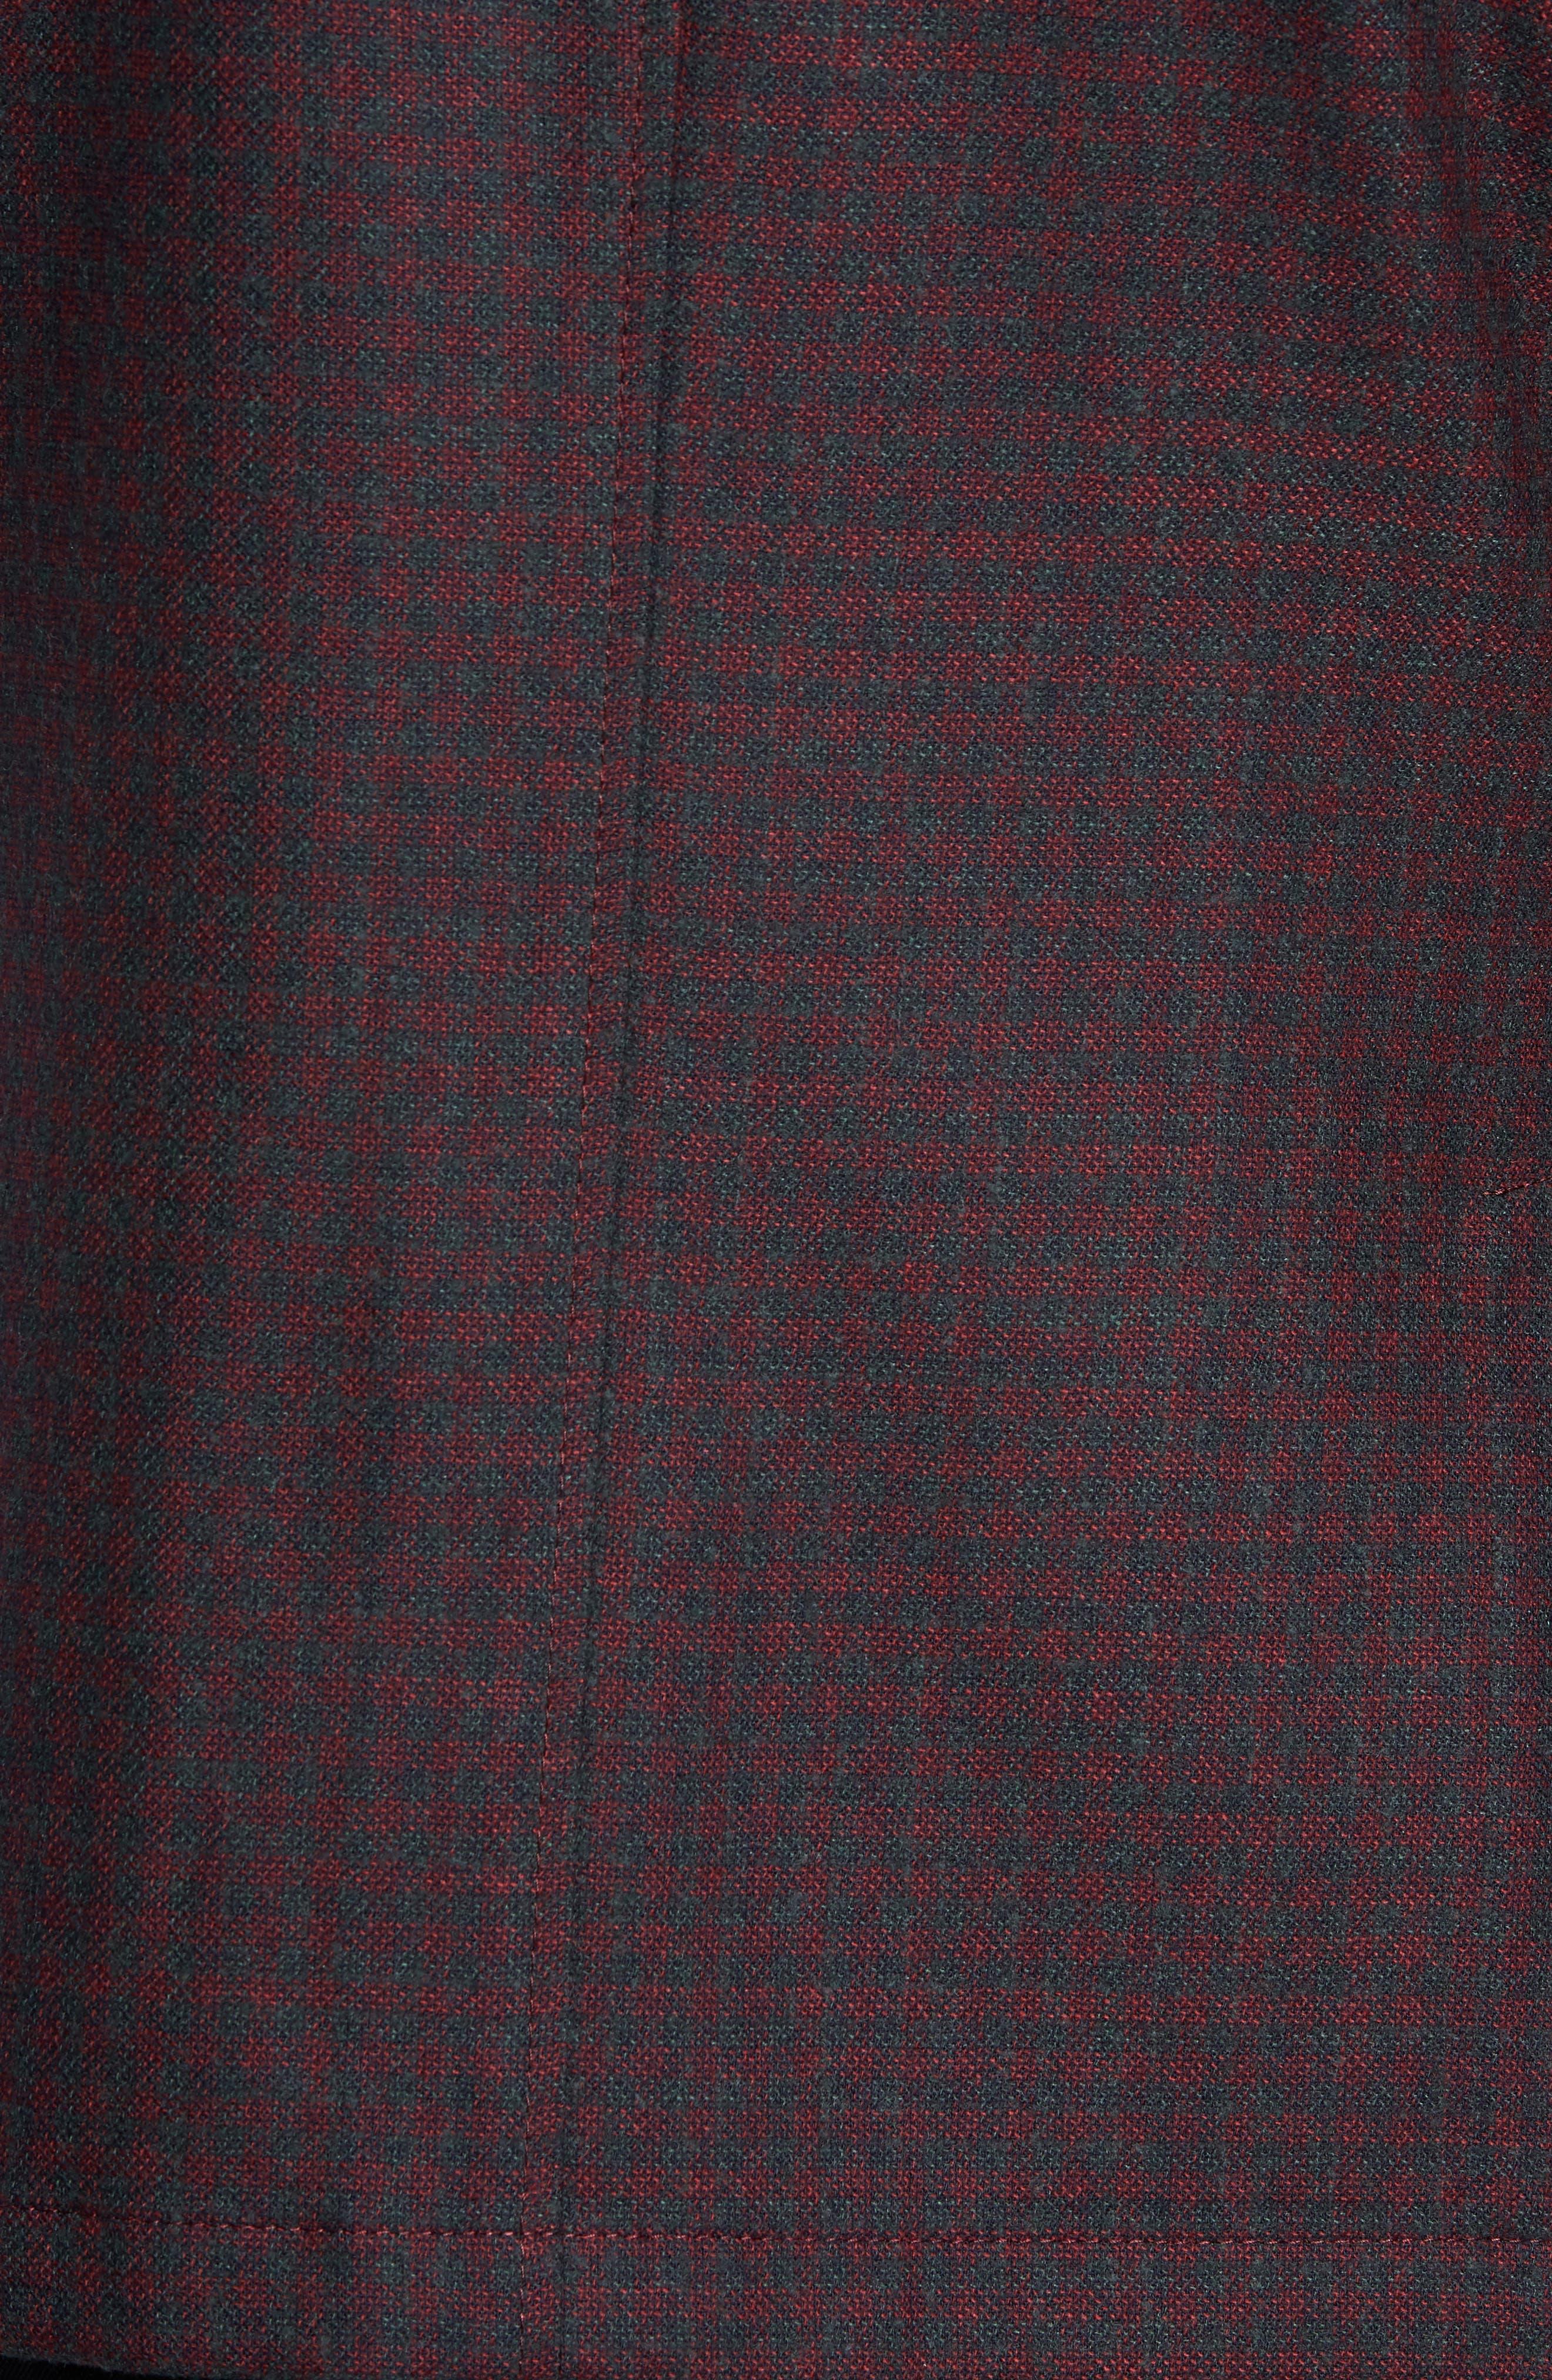 Regular Fit Wool Blend Sport Coat,                             Alternate thumbnail 6, color,                             RED